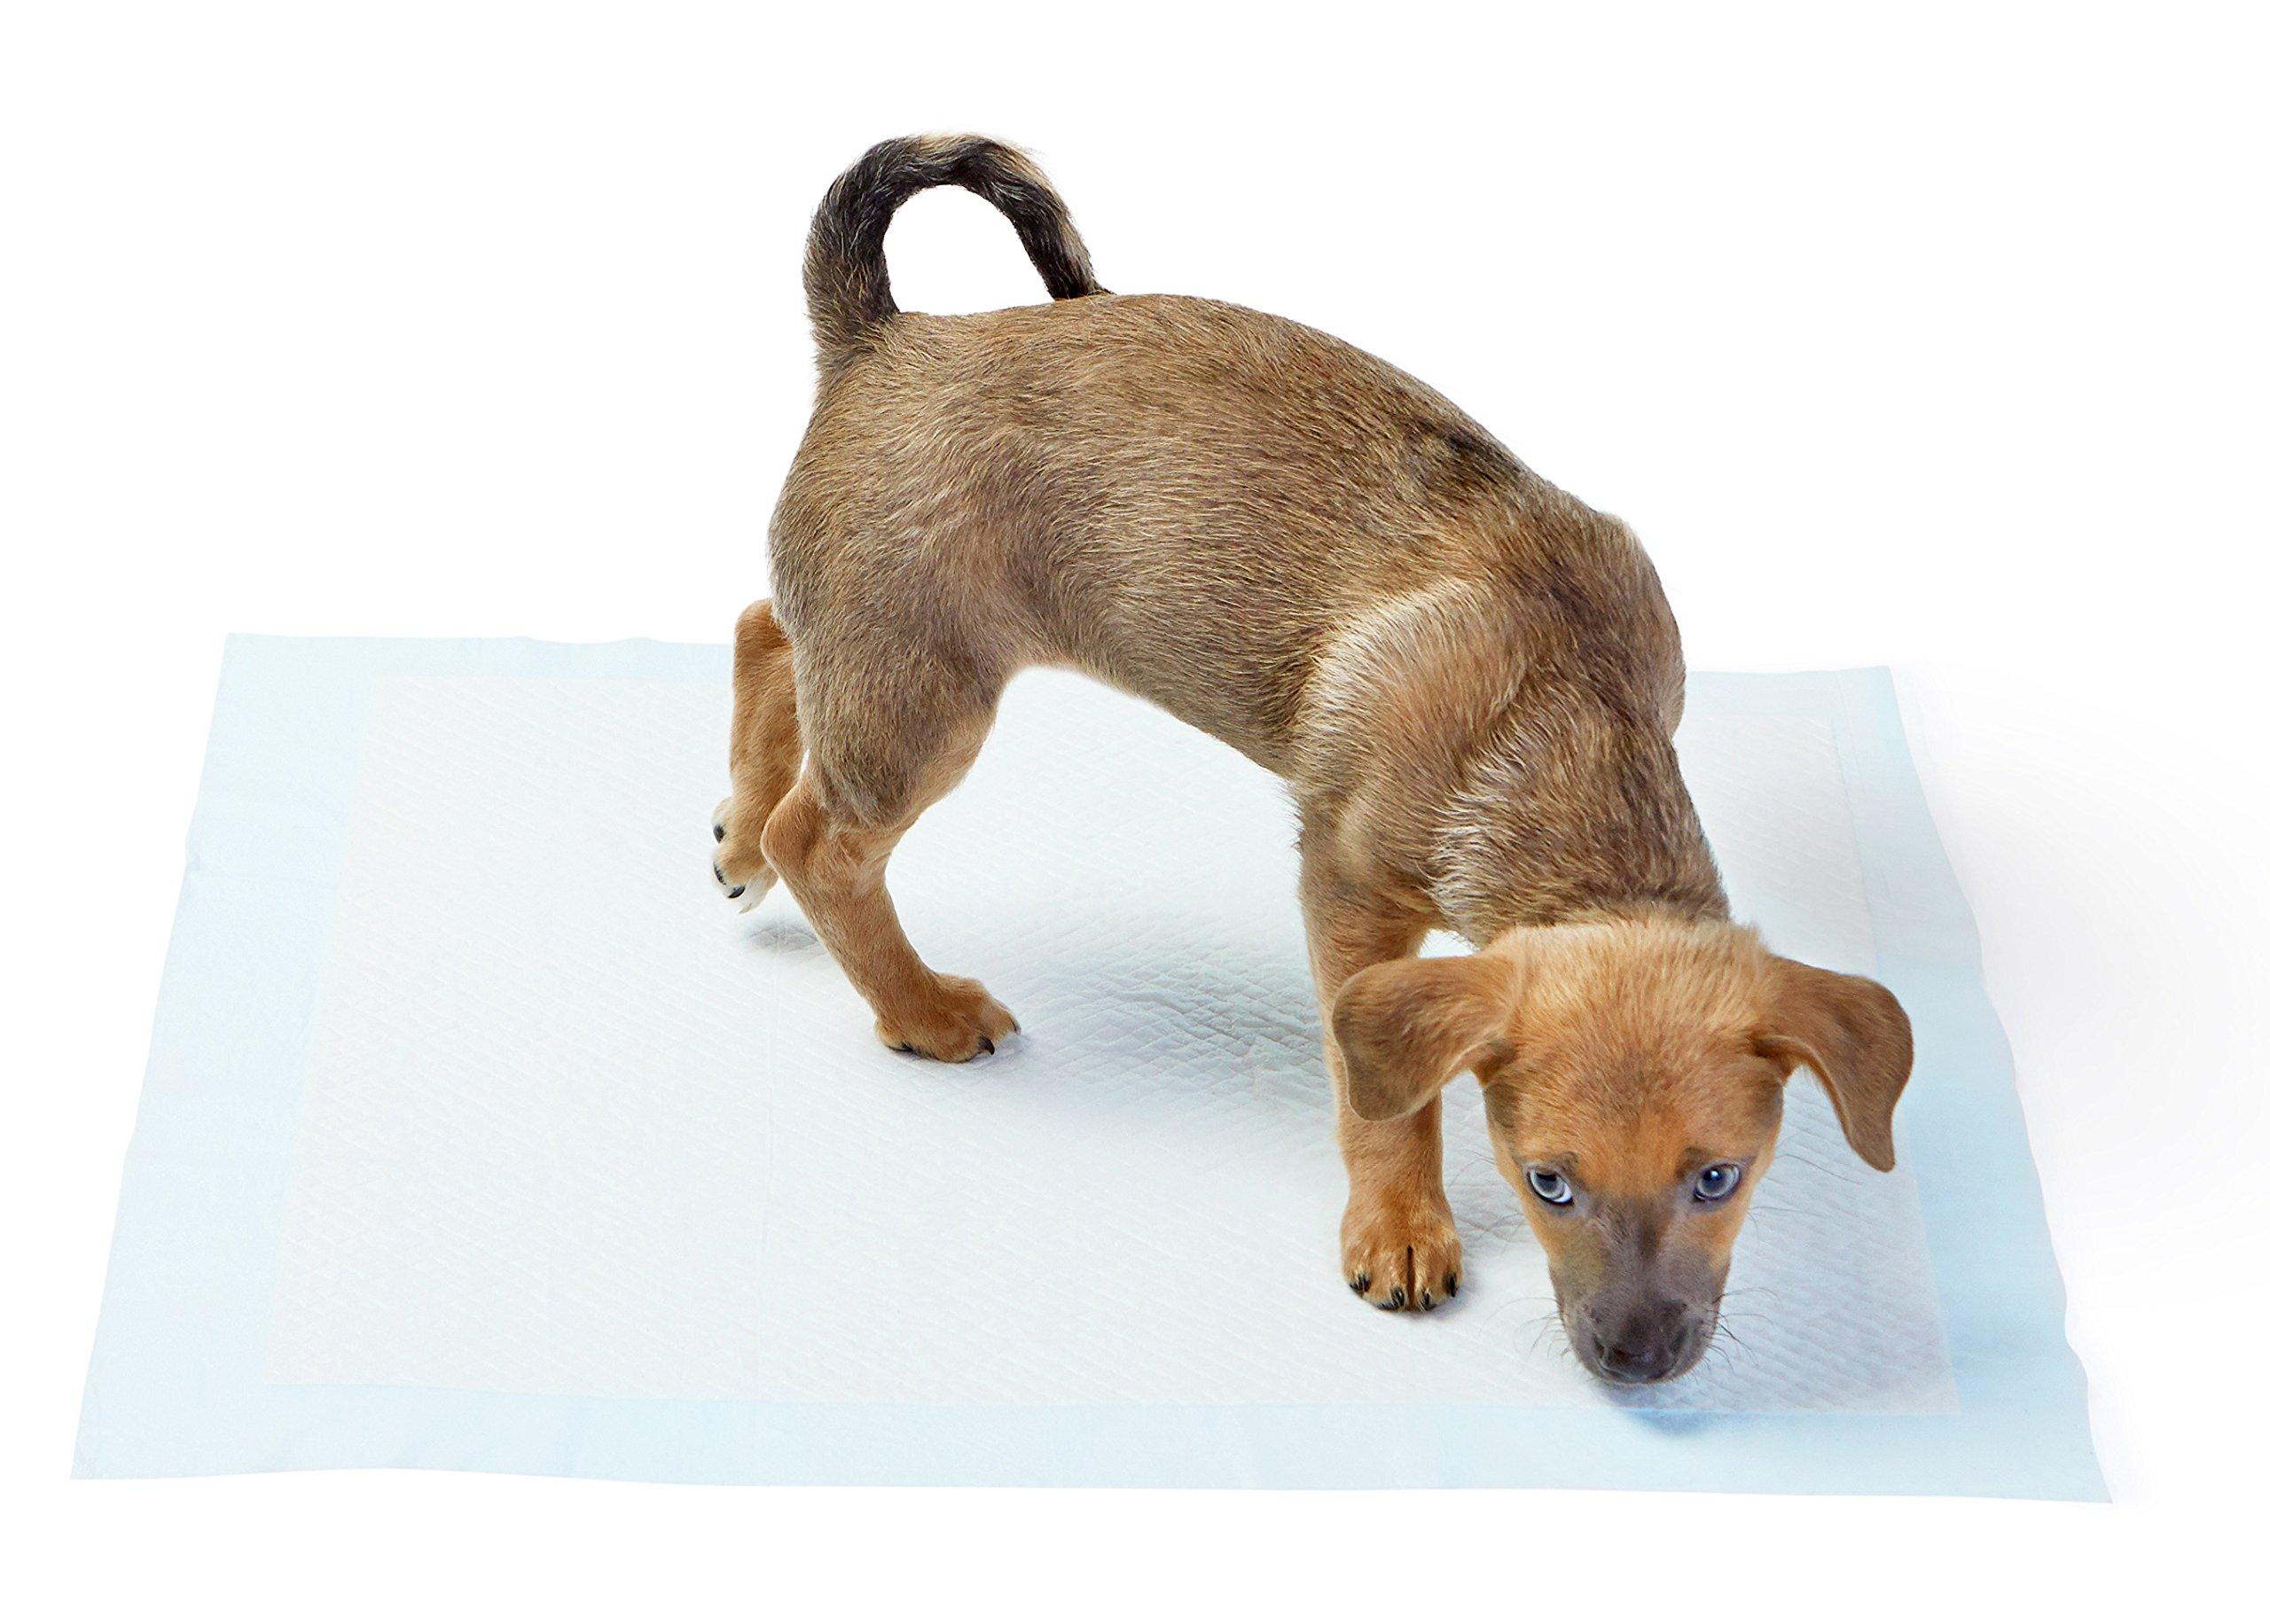 AmazonBasics Pet Training and Puppy Pads, Regular - 150 Count by AmazonBasics (Image #2)